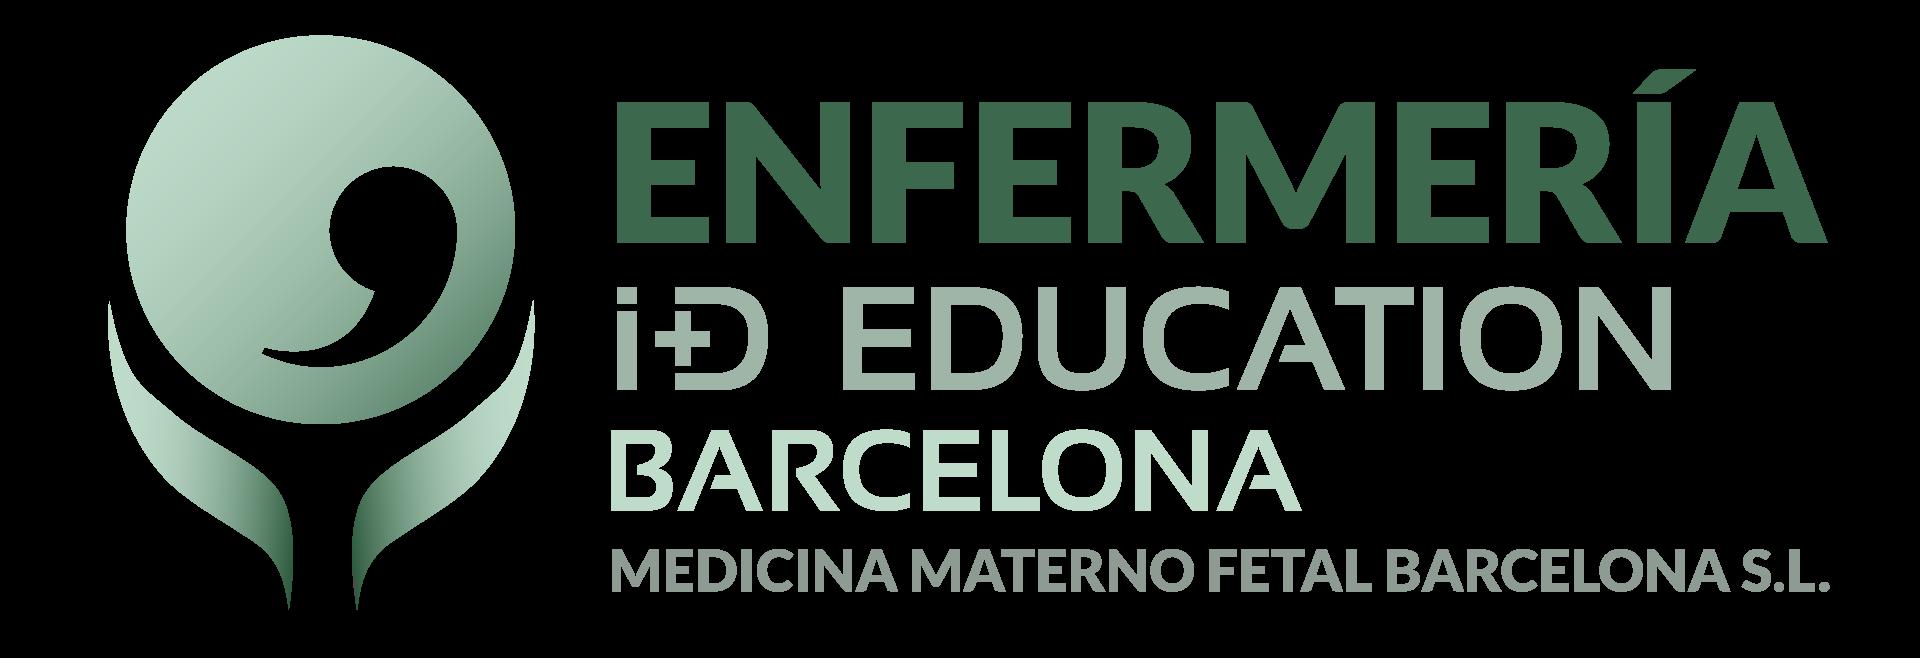 Logotipo enfermería barcelona